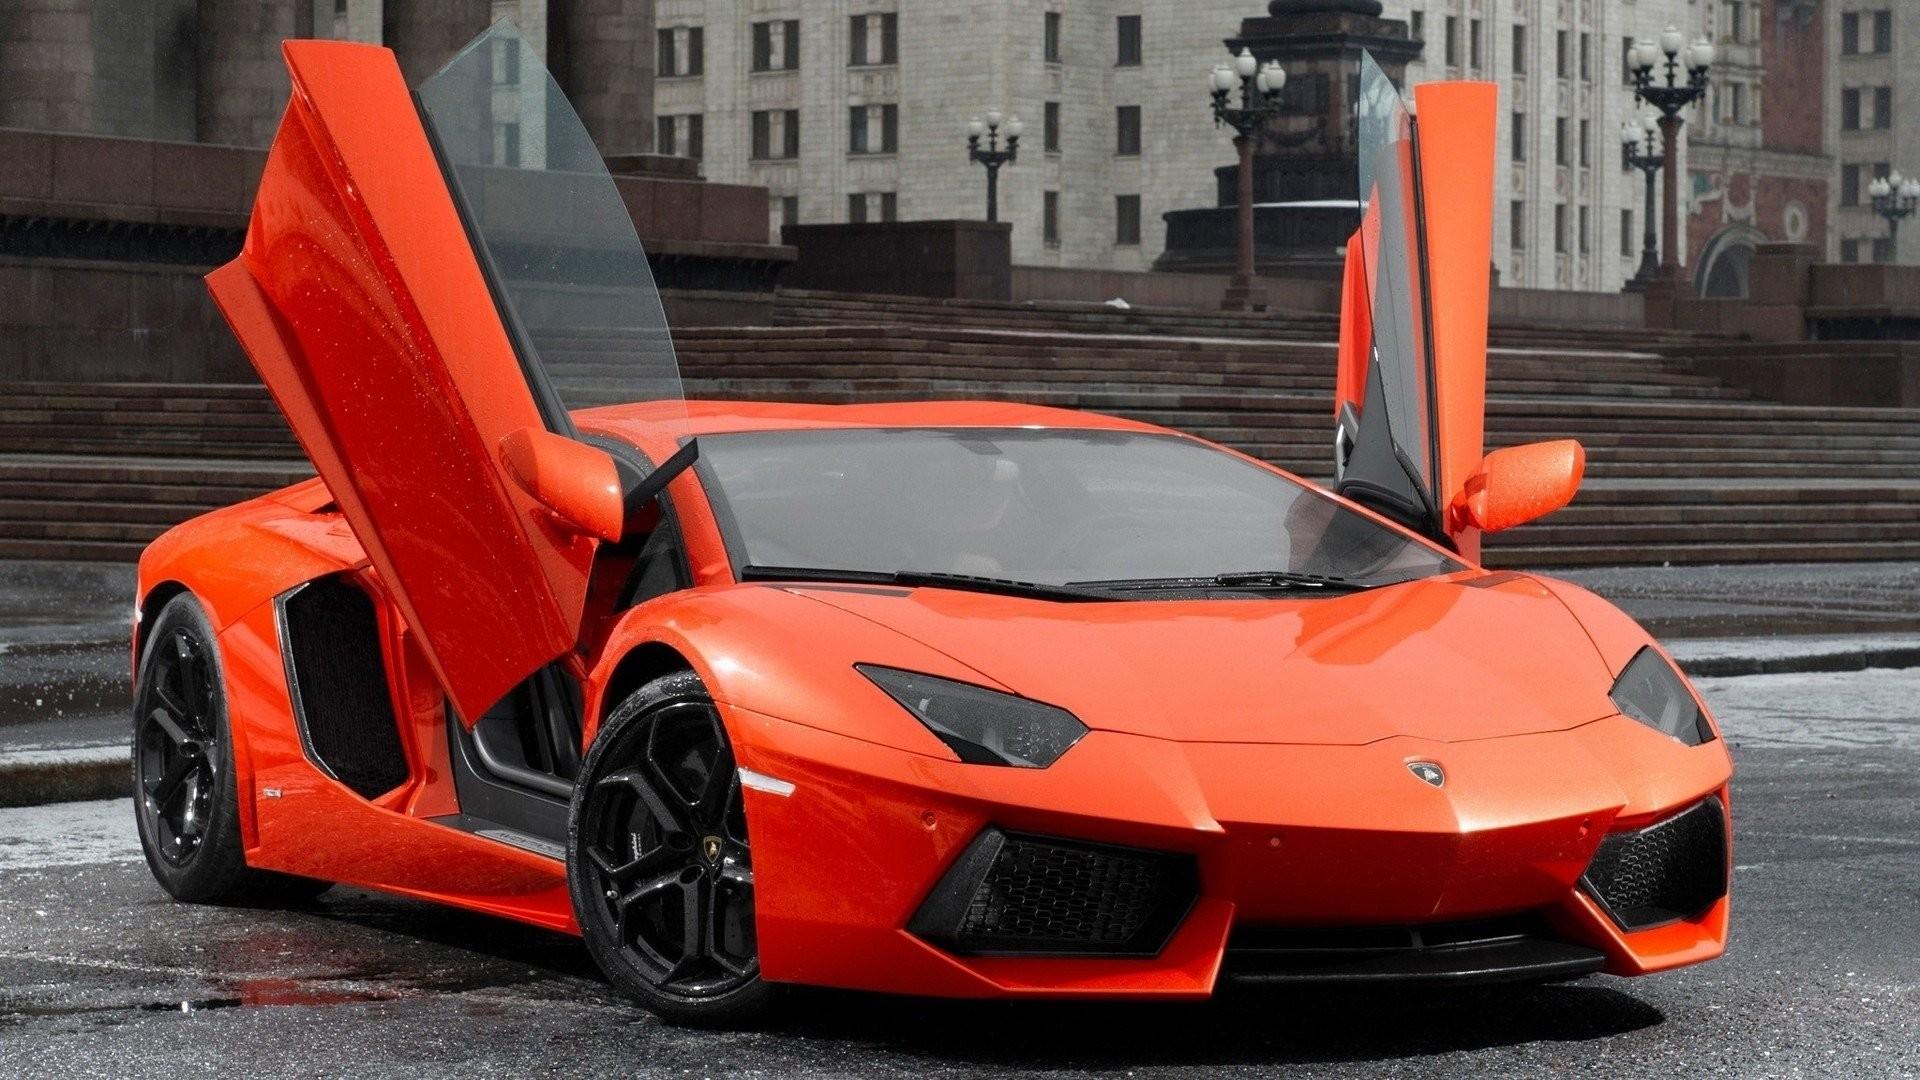 Wallpaper Full Hd 1080p Lamborghini New 2018 79 Images: Lamborghini Aventador Wallpaper ·① WallpaperTag